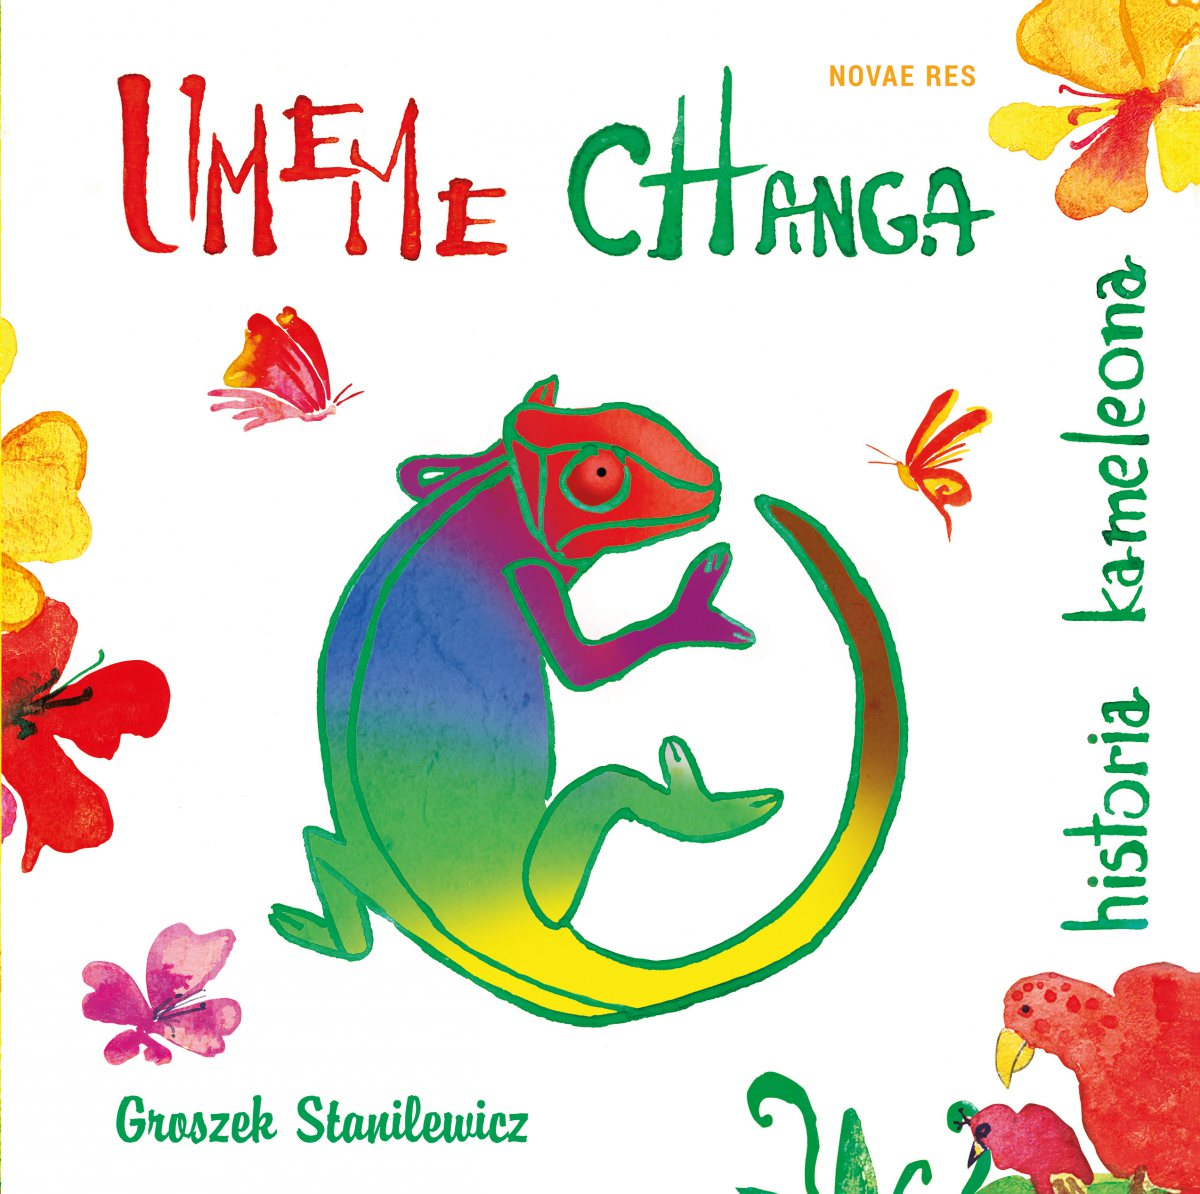 Umeme Changa. Historia kameleona - Ebook (Książka EPUB) do pobrania w formacie EPUB